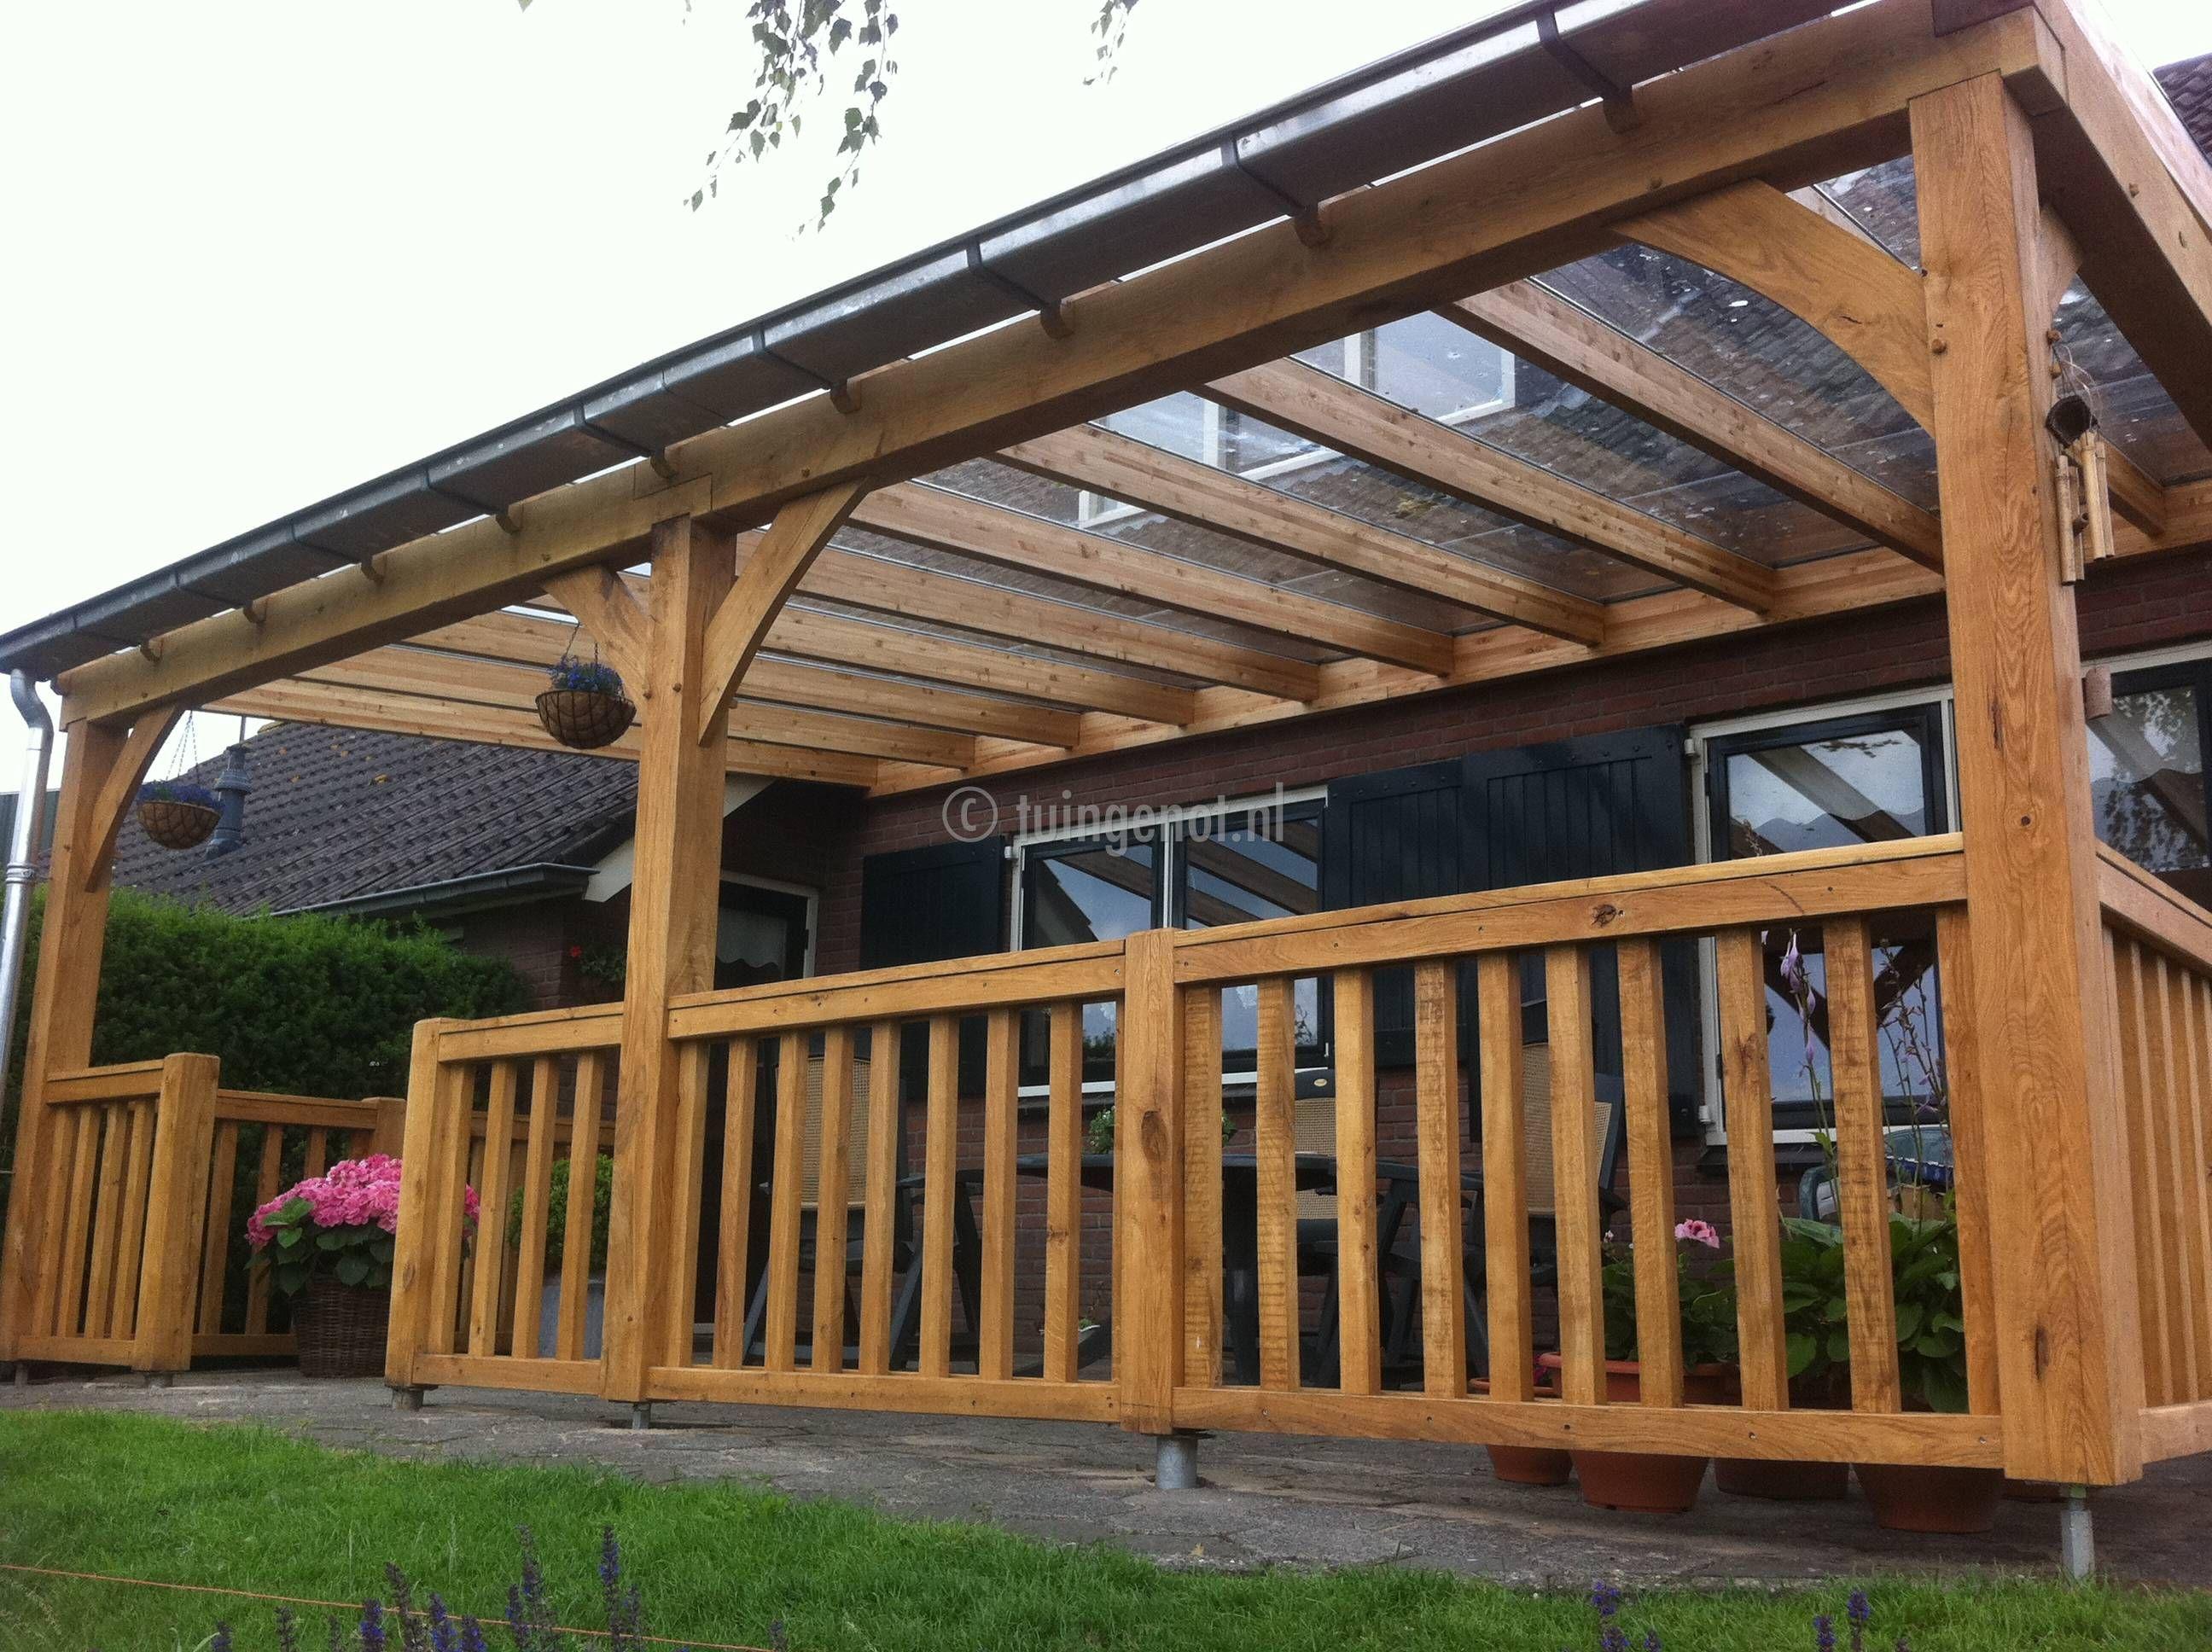 41. eiken houten veranda met glazen dak en balustrades glass